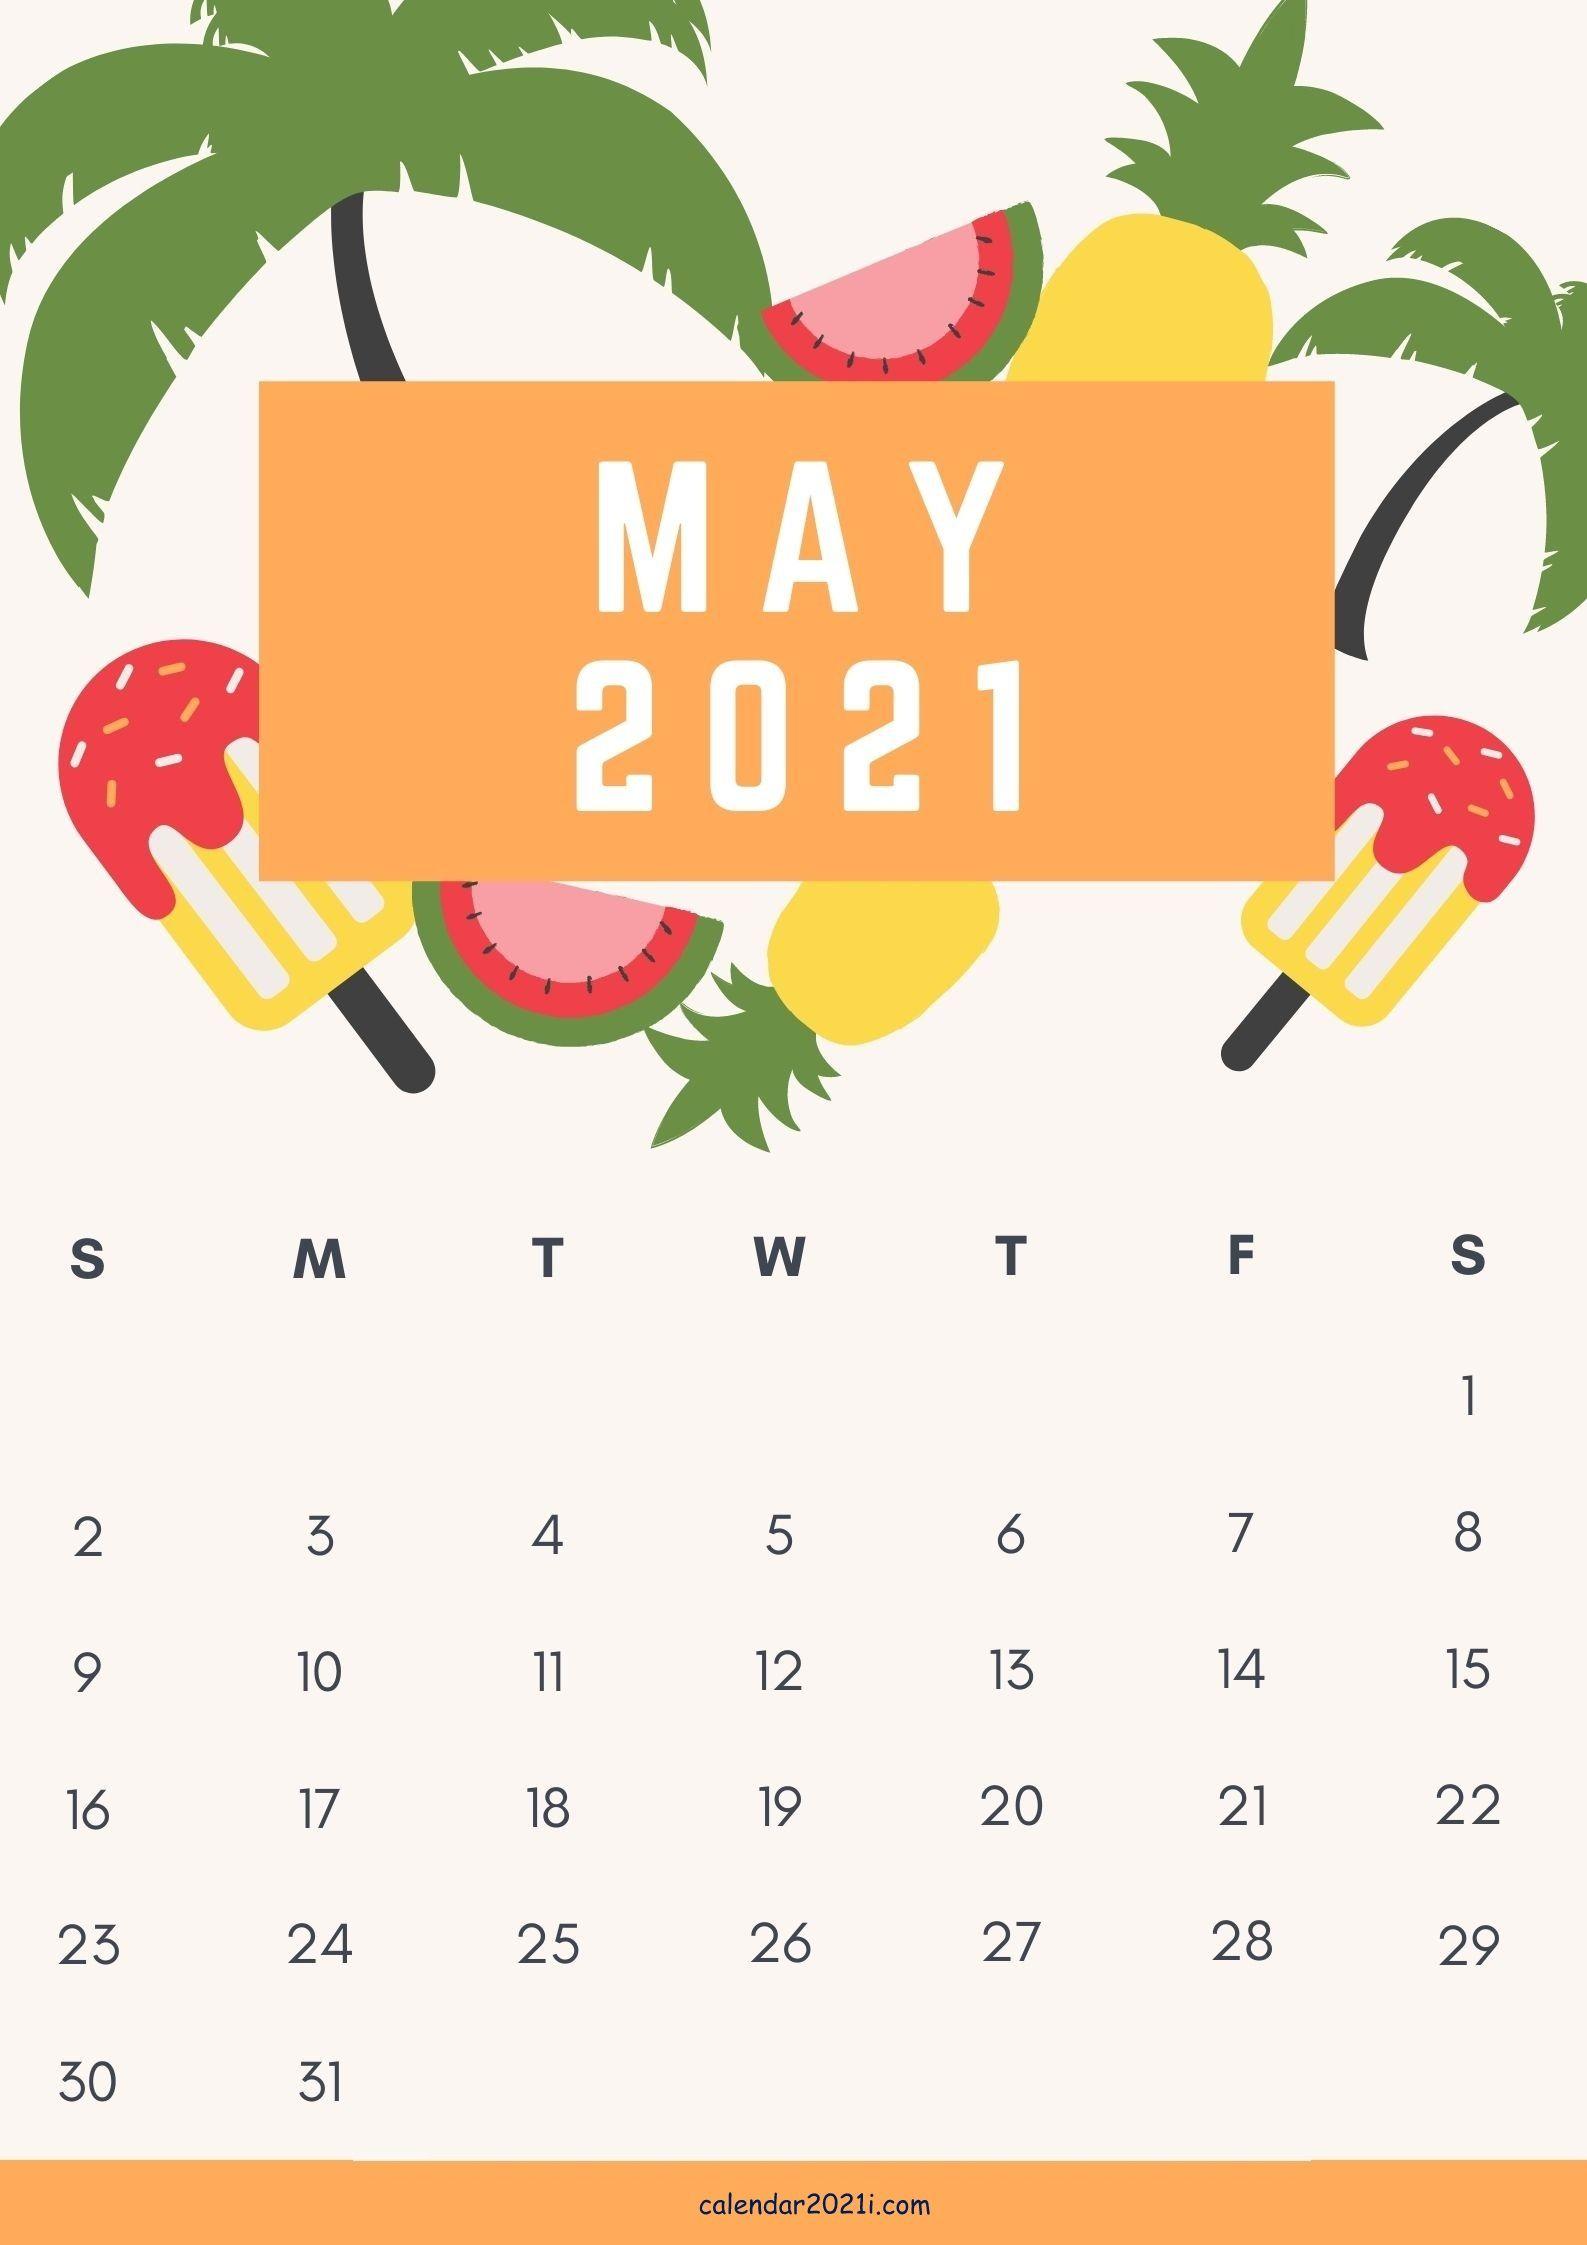 Cute May 2021 Calendar design template free download in ...